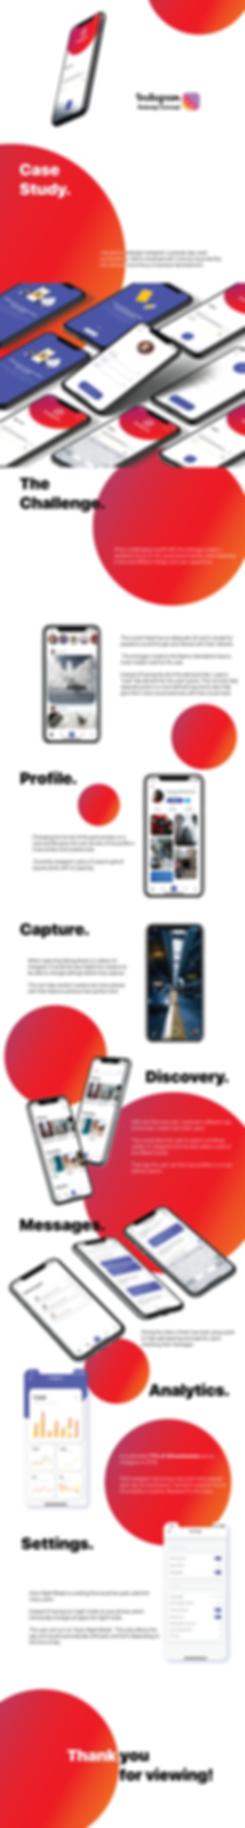 Instagram Redesign-01.png